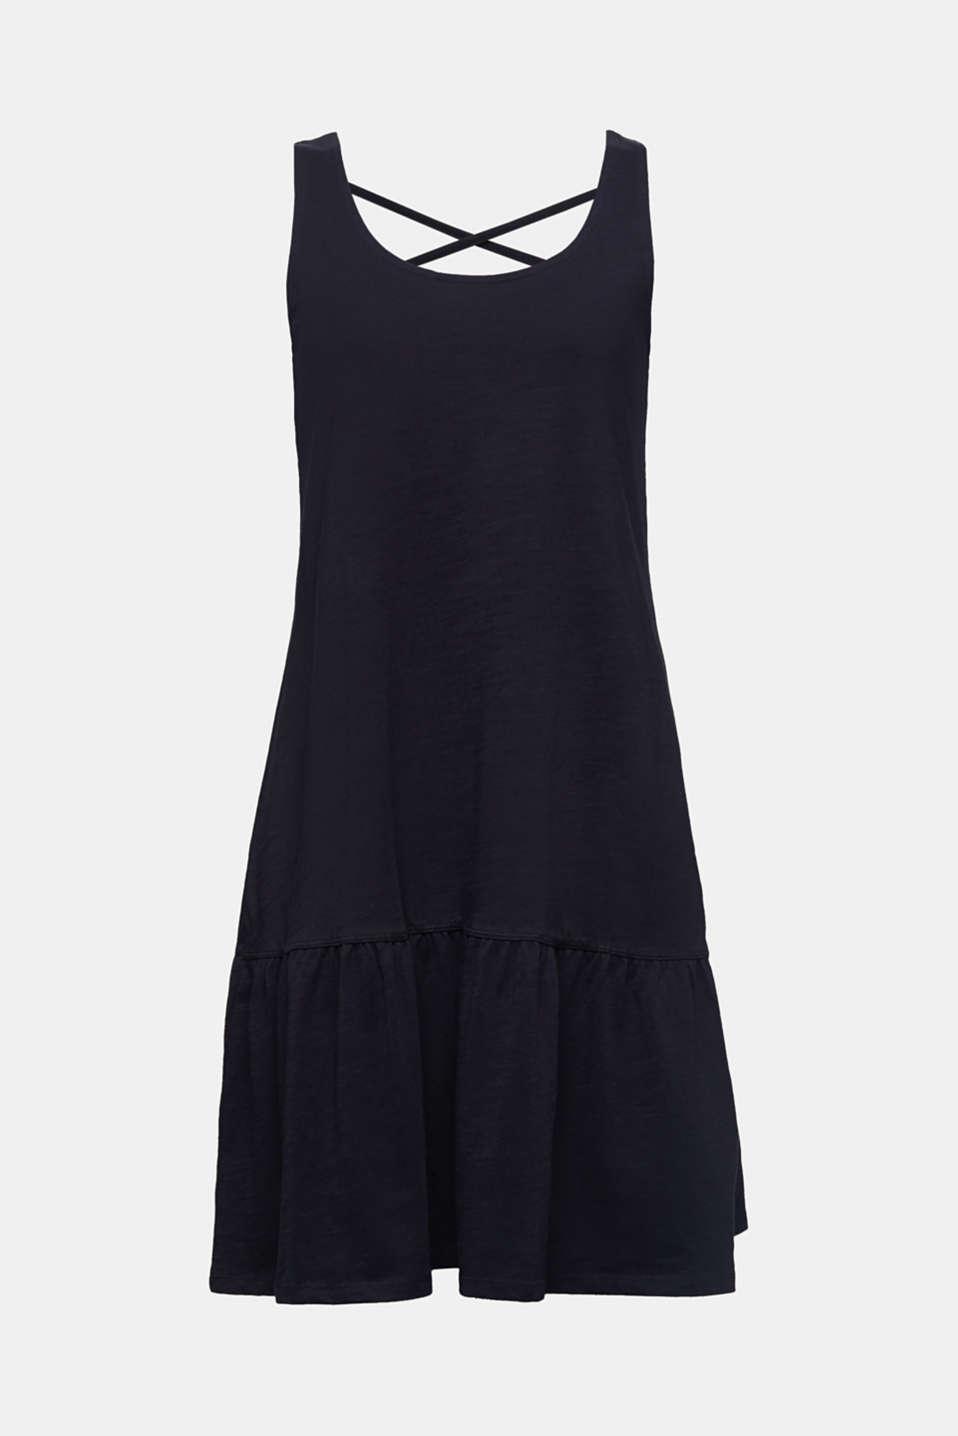 Jersey dress in 100% cotton, BLACK, detail image number 6